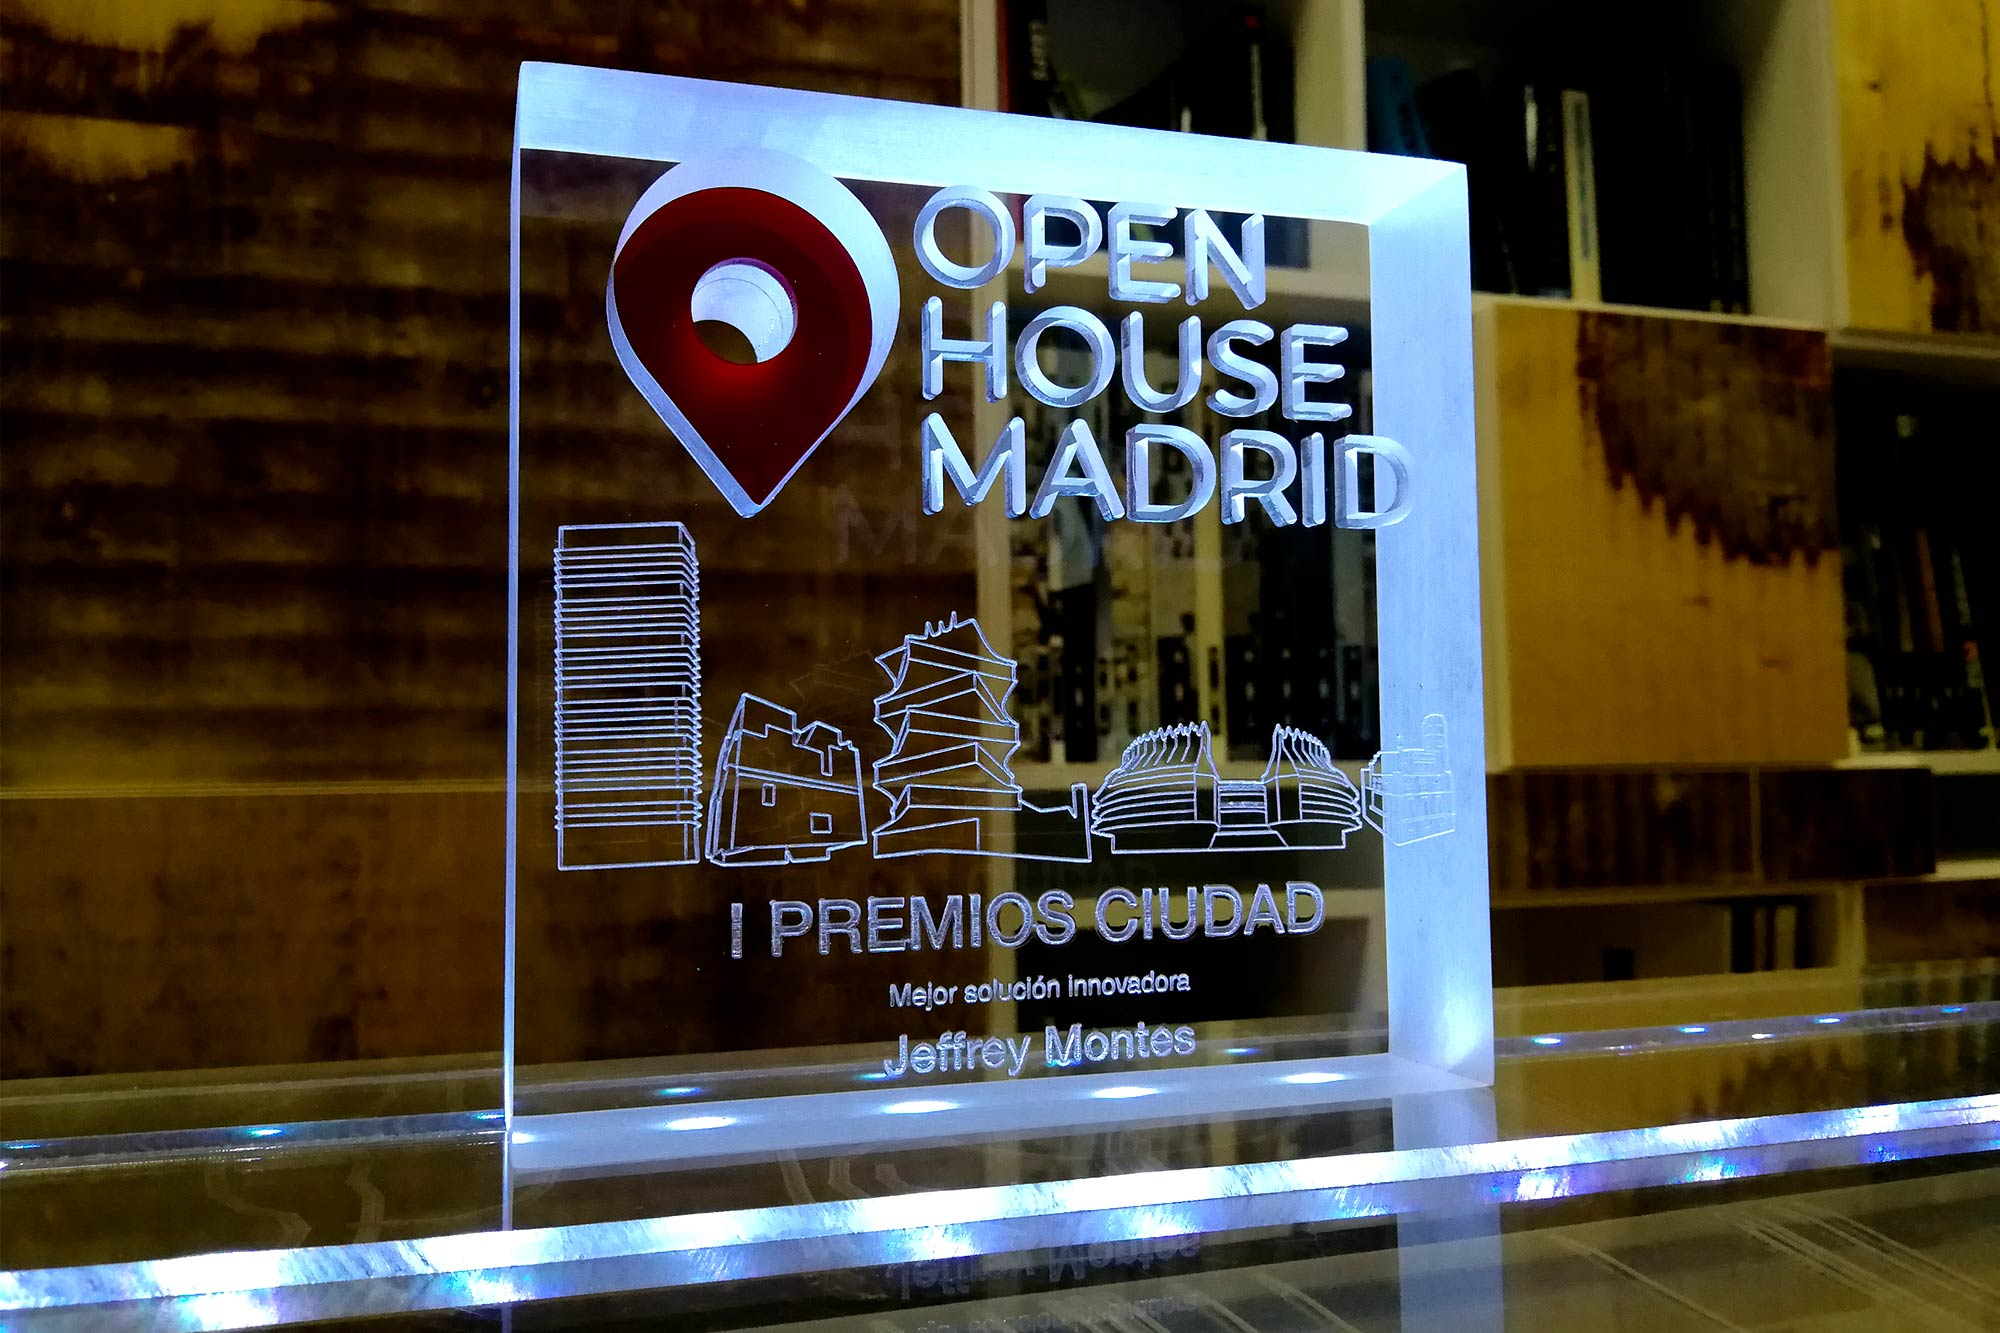 Premios-Ciudad_-Open-House-Madrid_-Diseño-_-EXarchitects_08